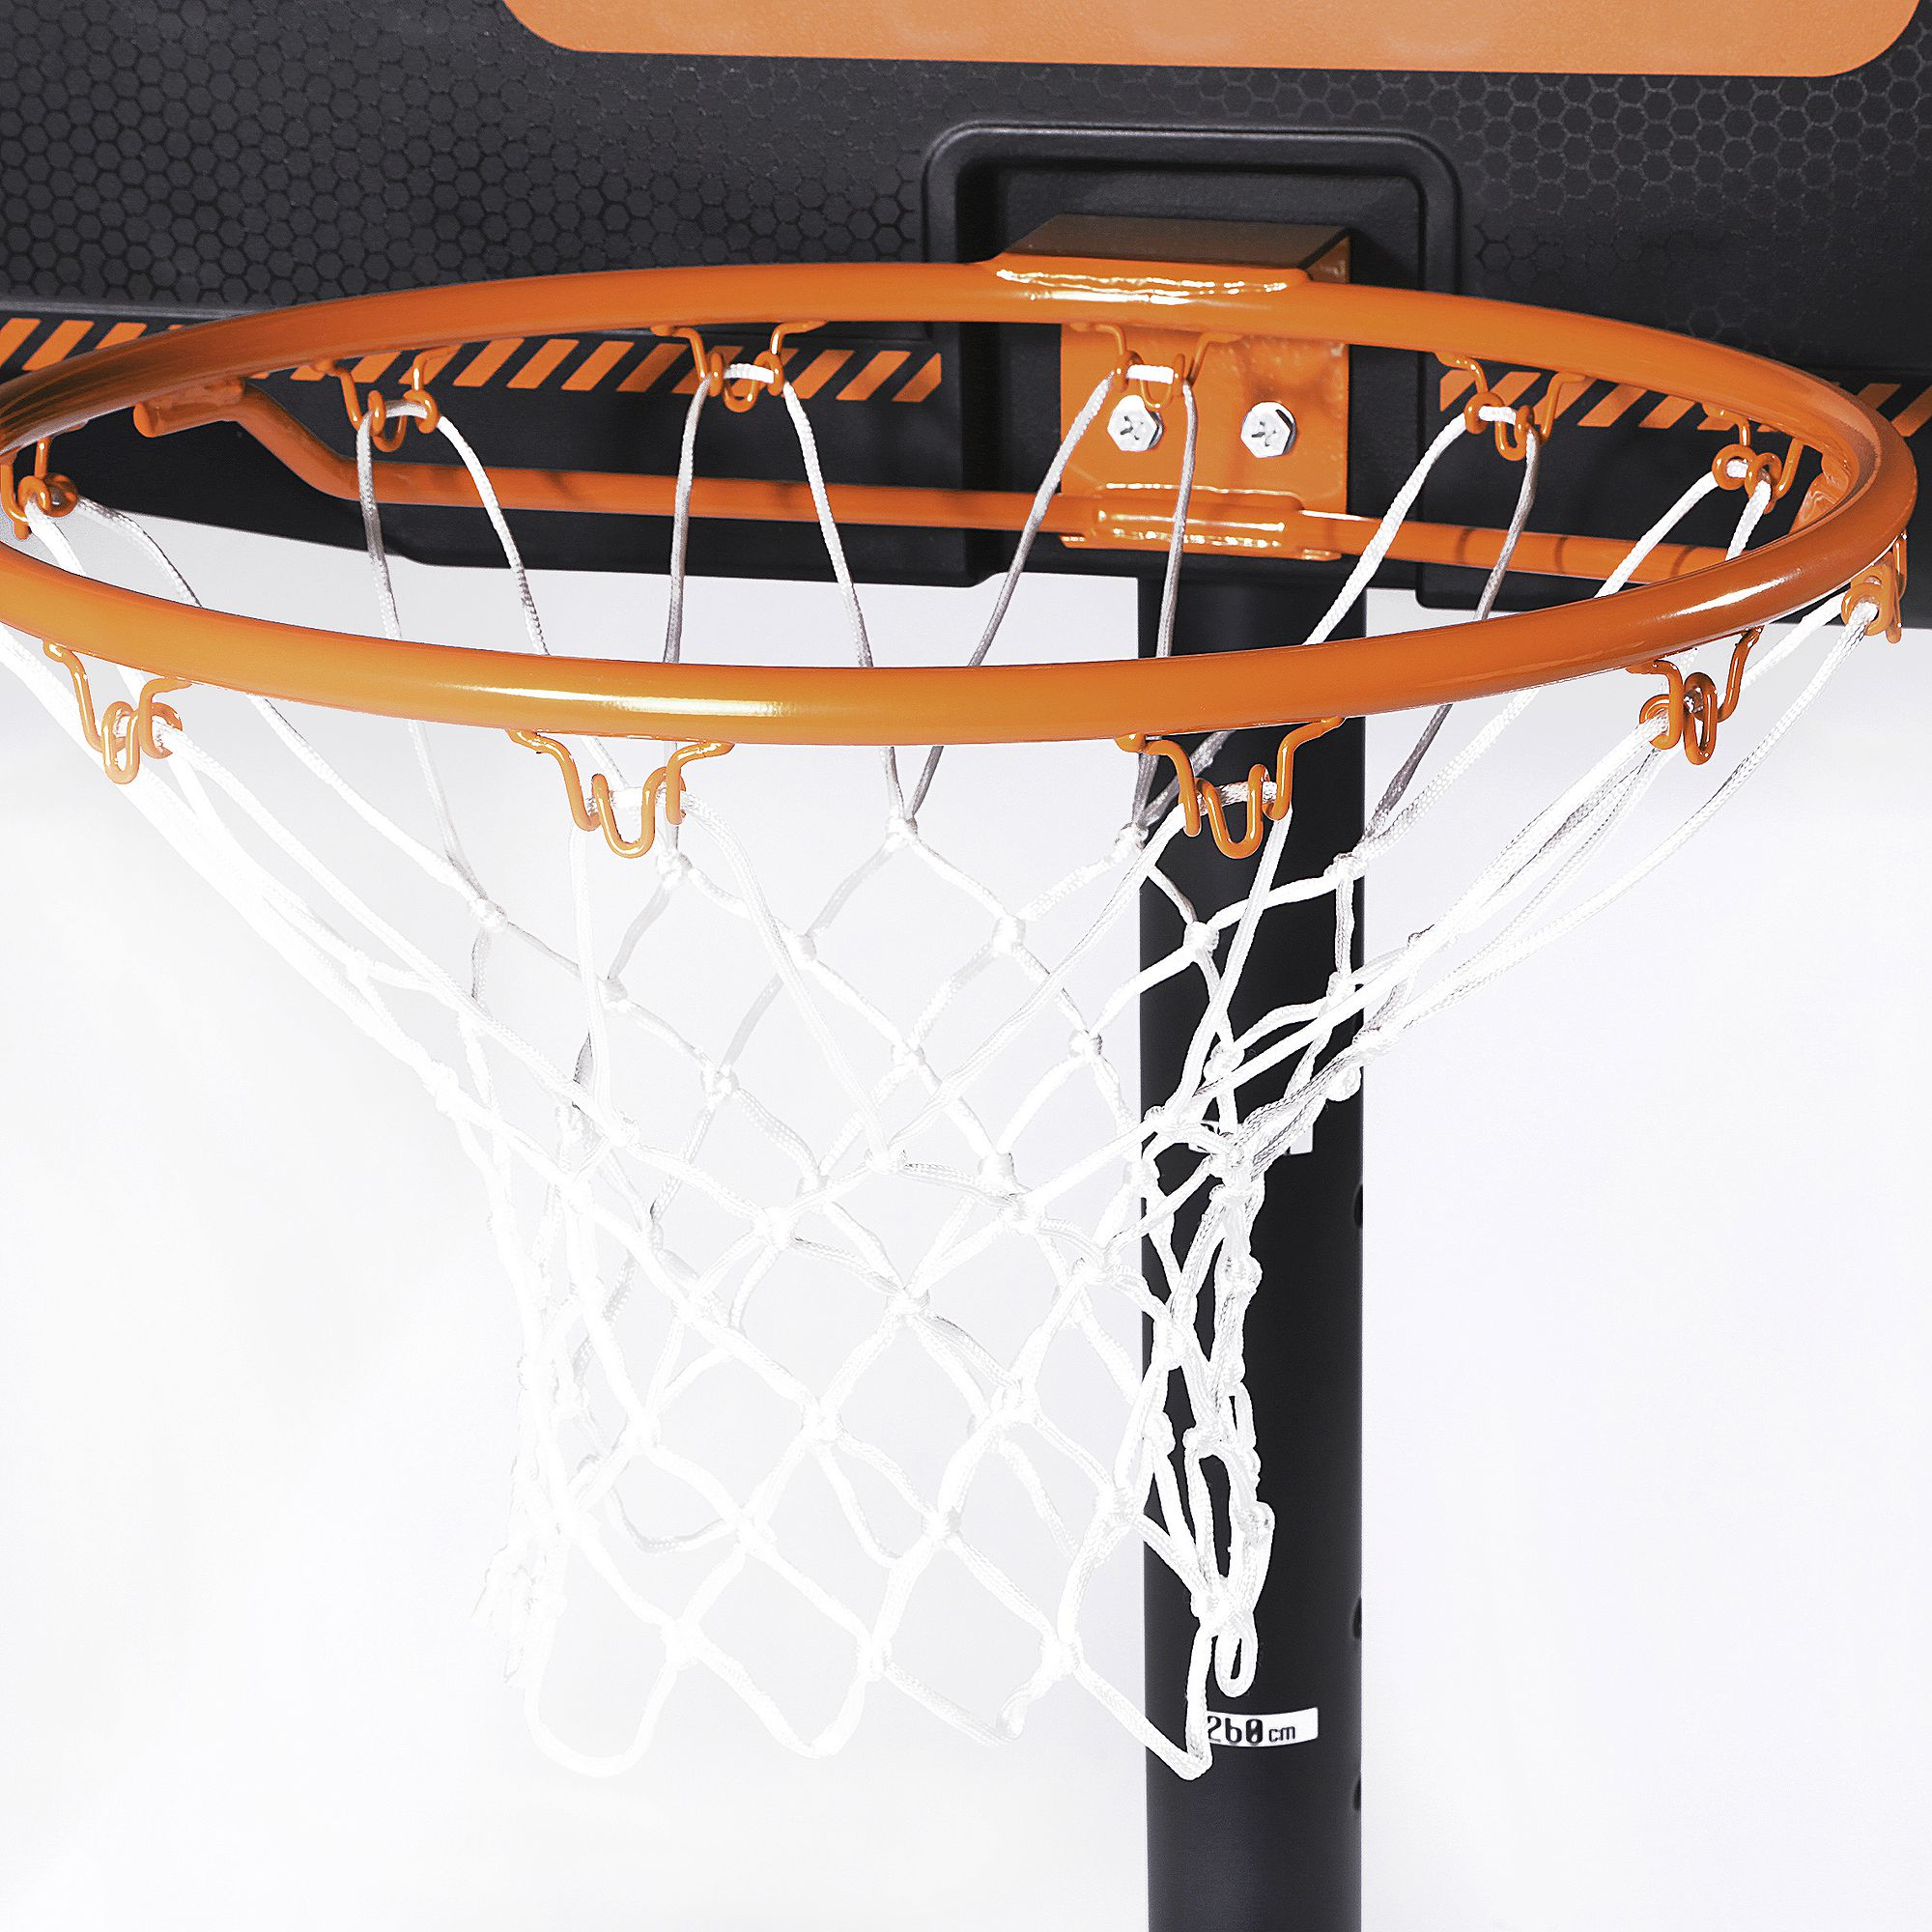 panier de basket enfant adulte b300 noir orange 2 20m 3. Black Bedroom Furniture Sets. Home Design Ideas